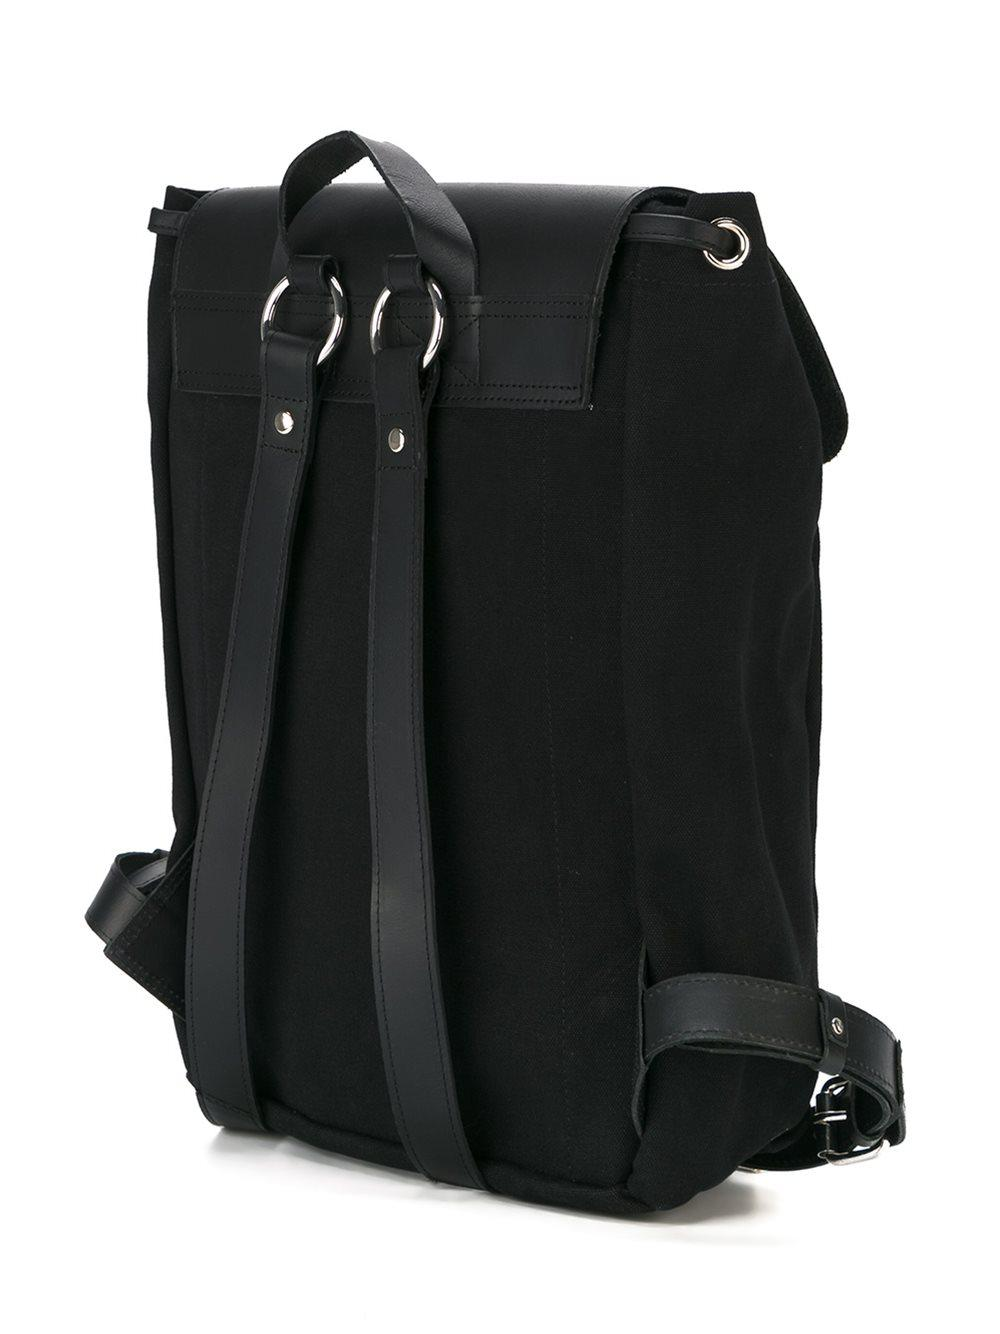 Sandqvist Leather 'alva' Backpack in Black